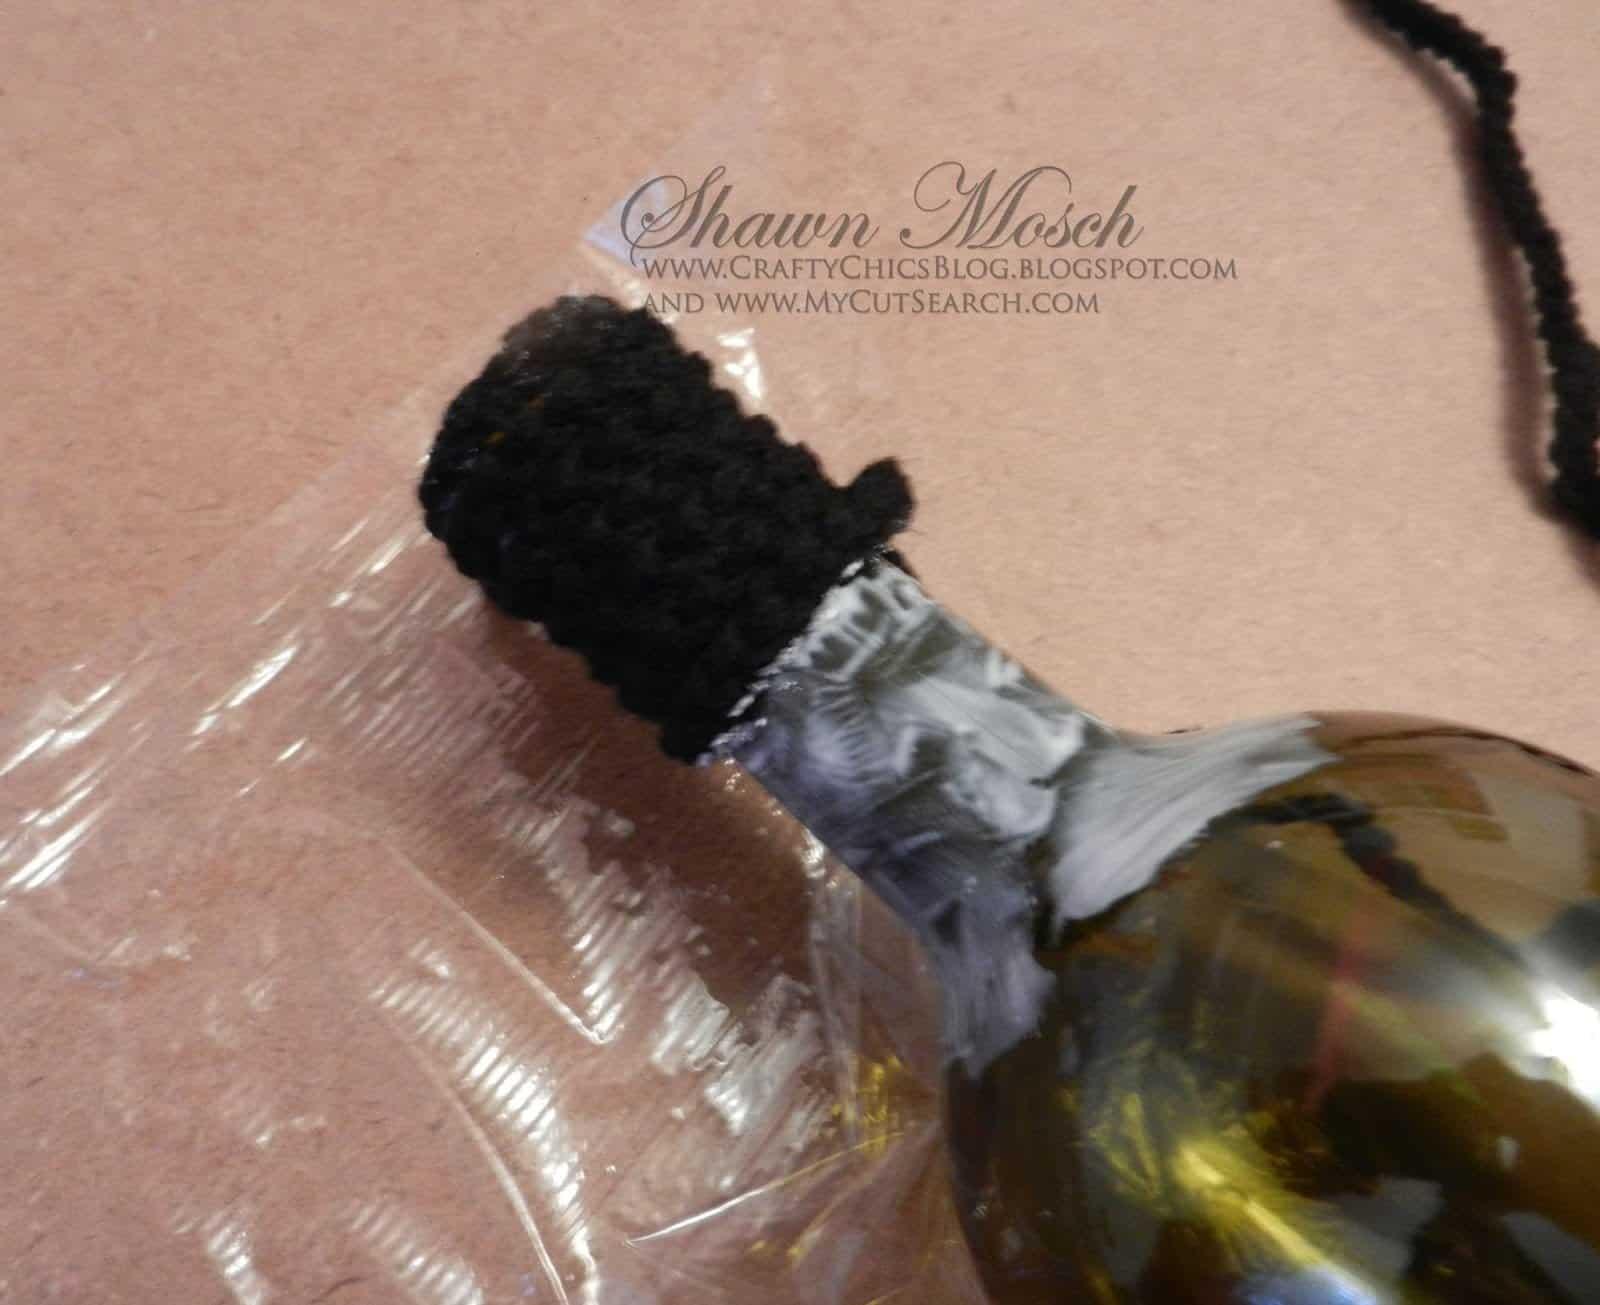 Mickey Mouse wine bottle